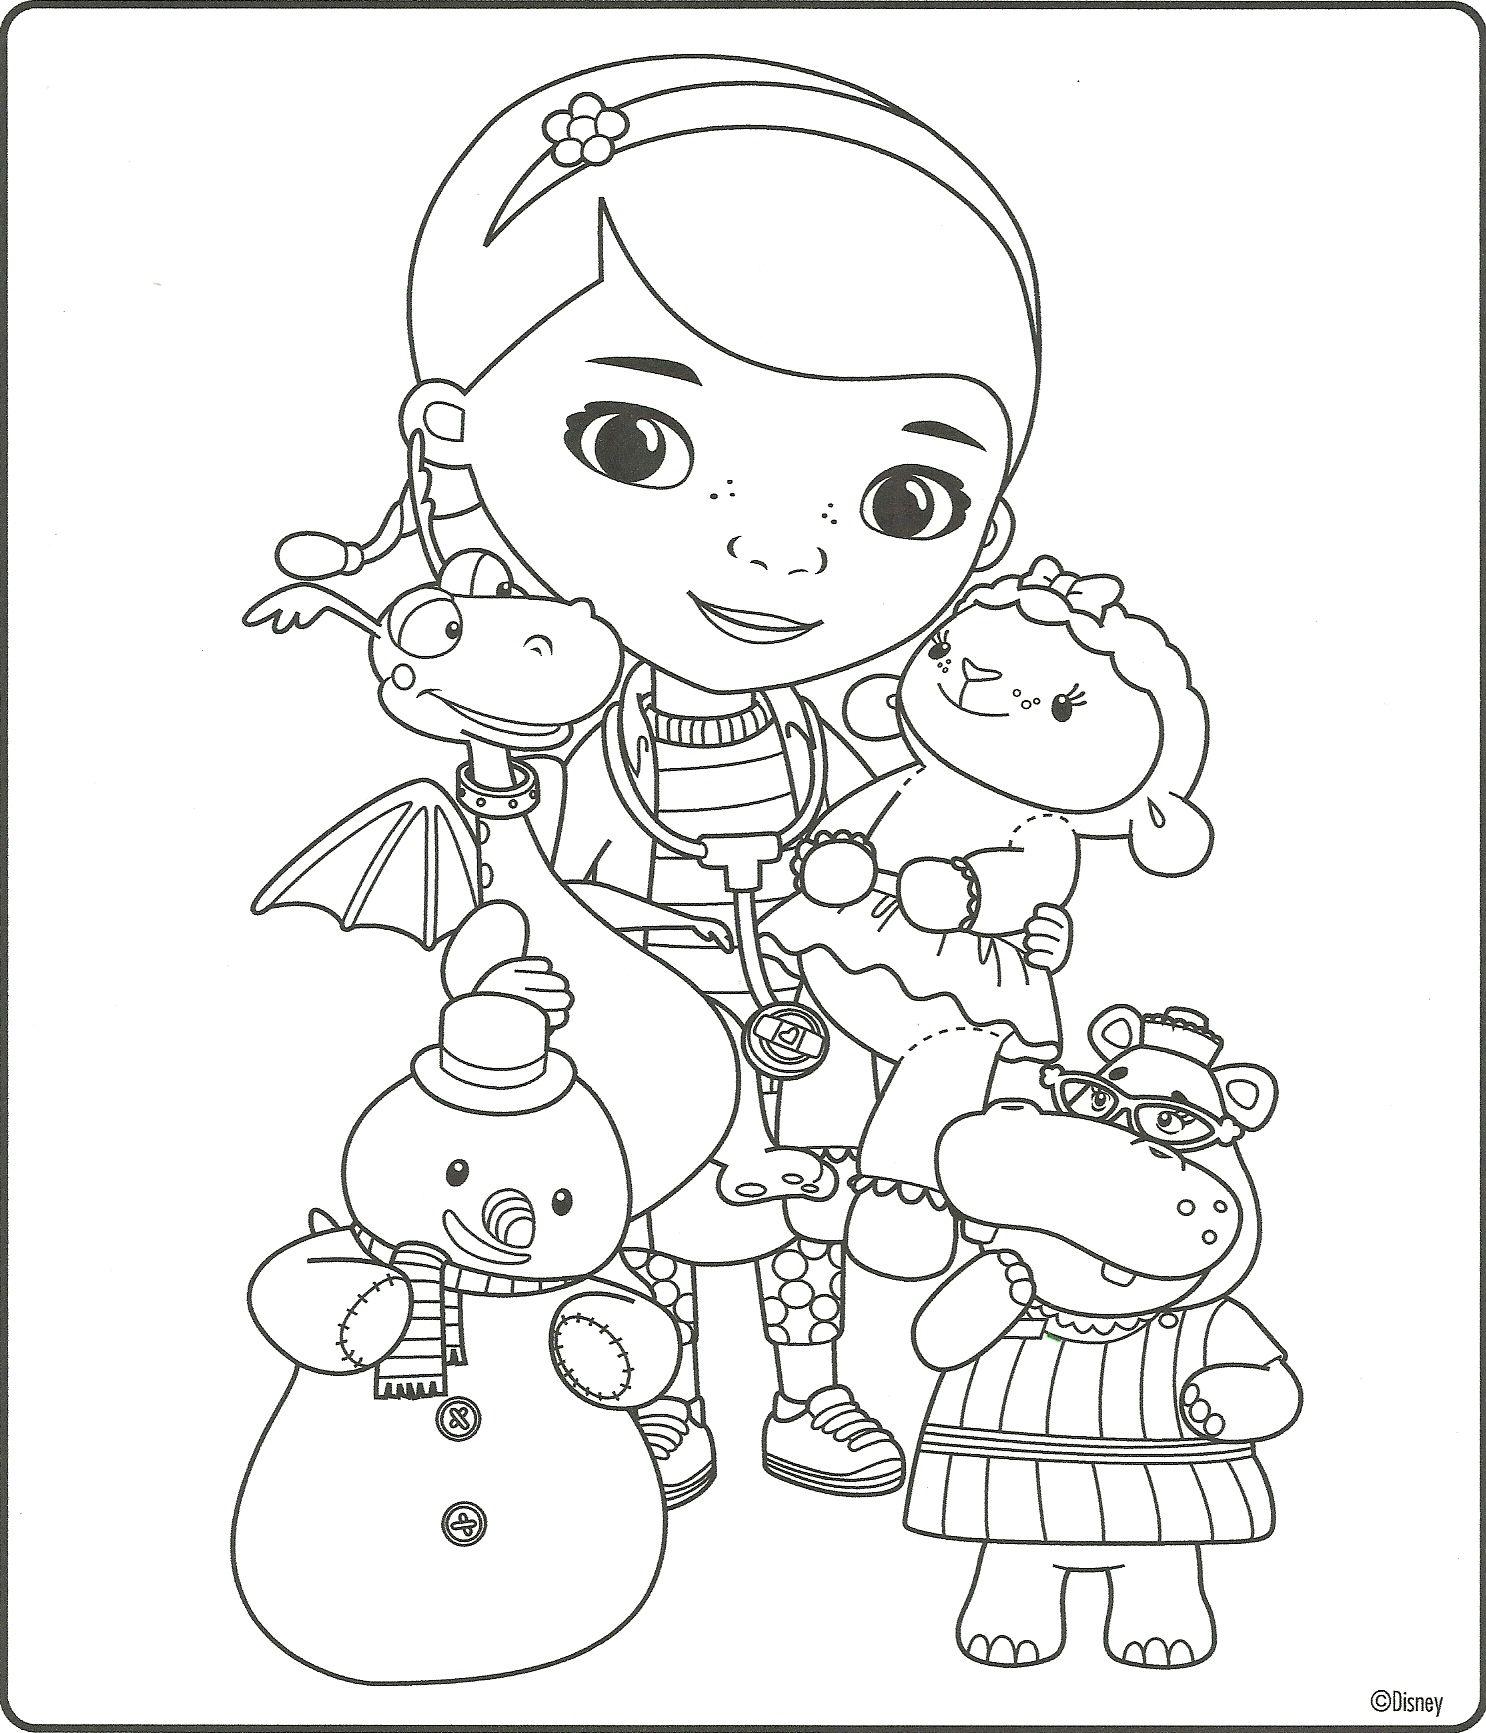 Free printable coloring pages doc mcstuffins - Doc Mcstuffins Coloring Page